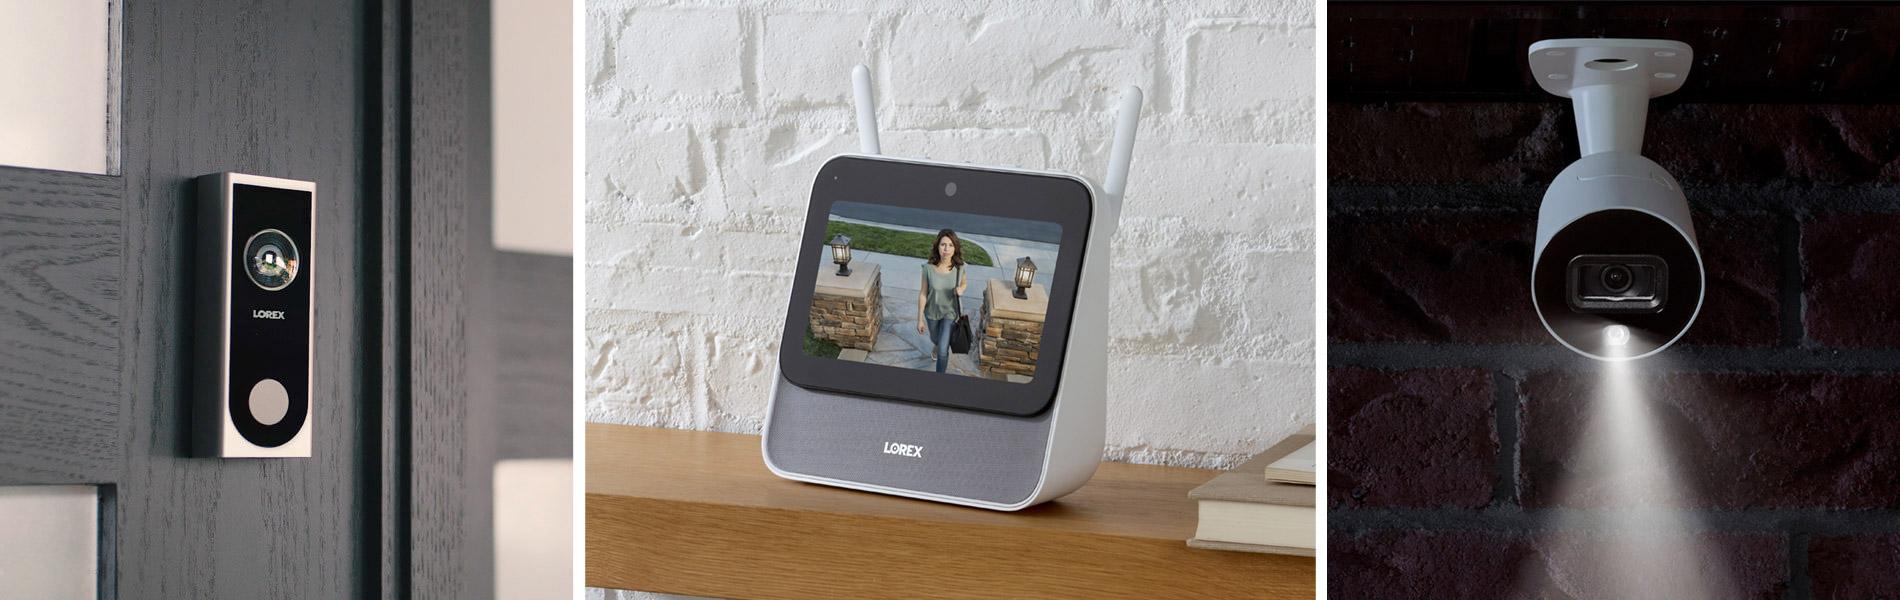 Lorex Smart Home Security Center and Indoor / Outdoor Cameras